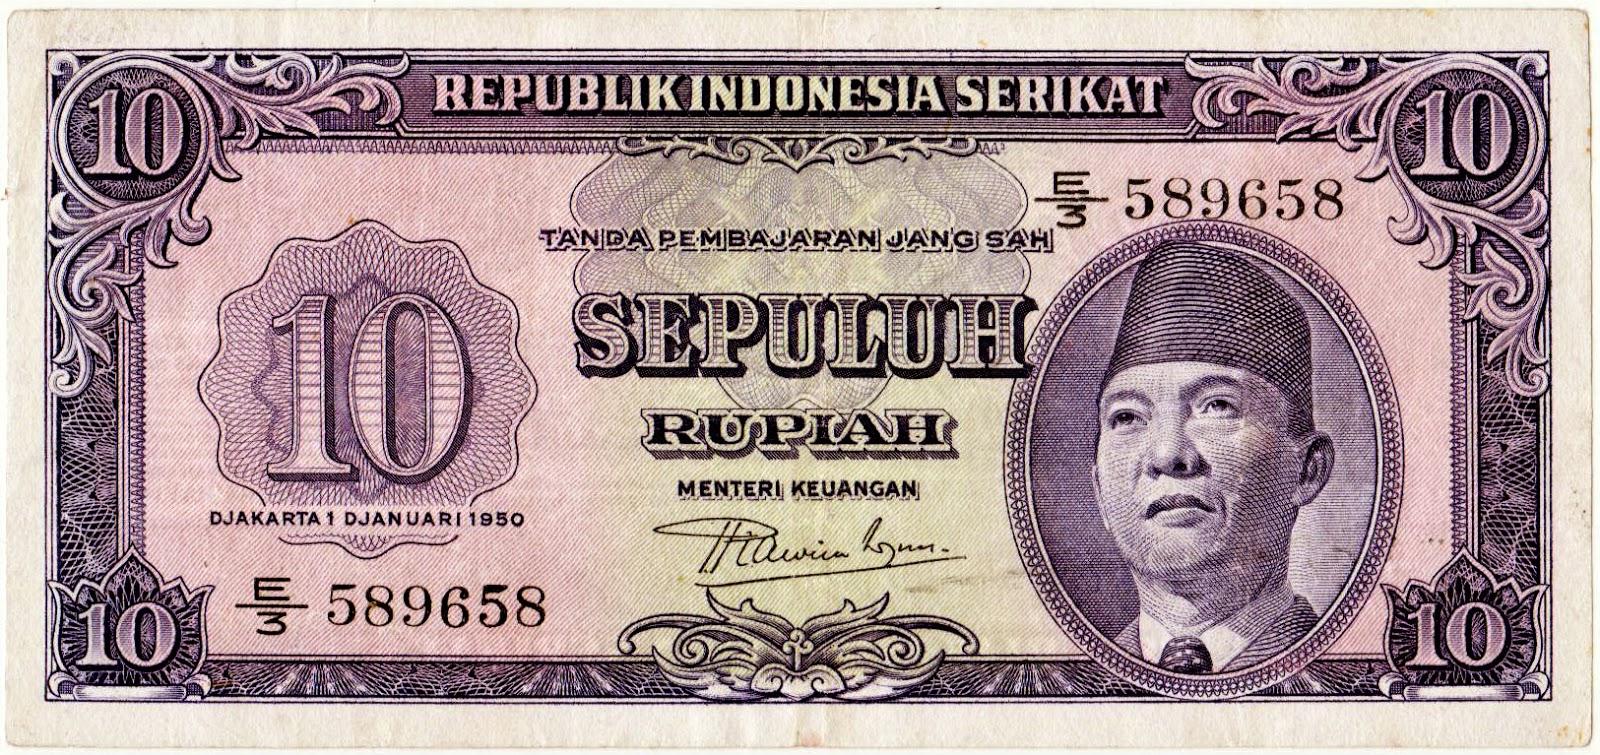 http://moneyzooms.blogspot.com/2015/01/uang-kuno-indonesia-10-rupiah-tahun-1950.html